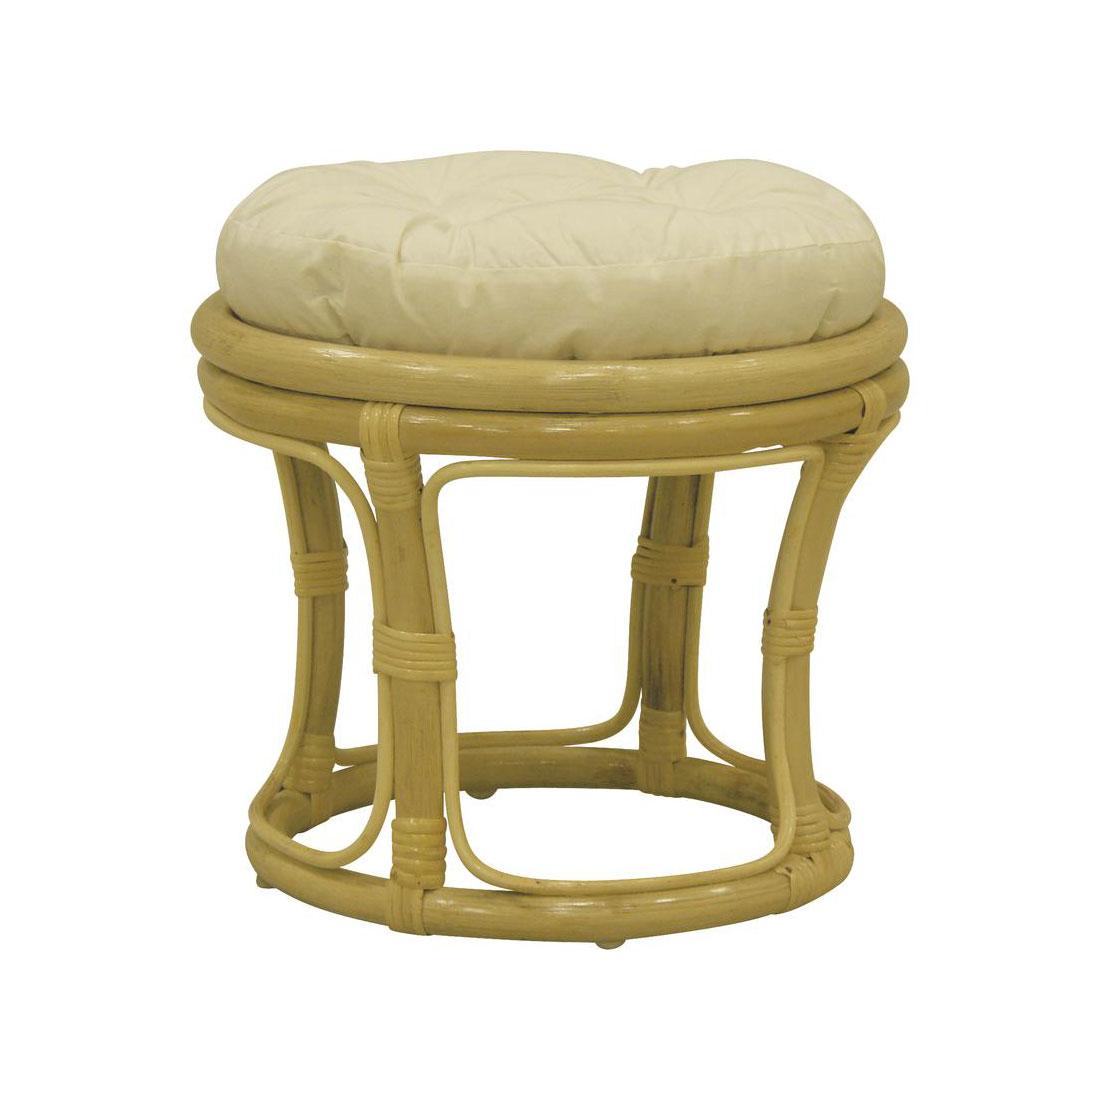 pouf bois rotin naturel avec coussin cru 5474. Black Bedroom Furniture Sets. Home Design Ideas